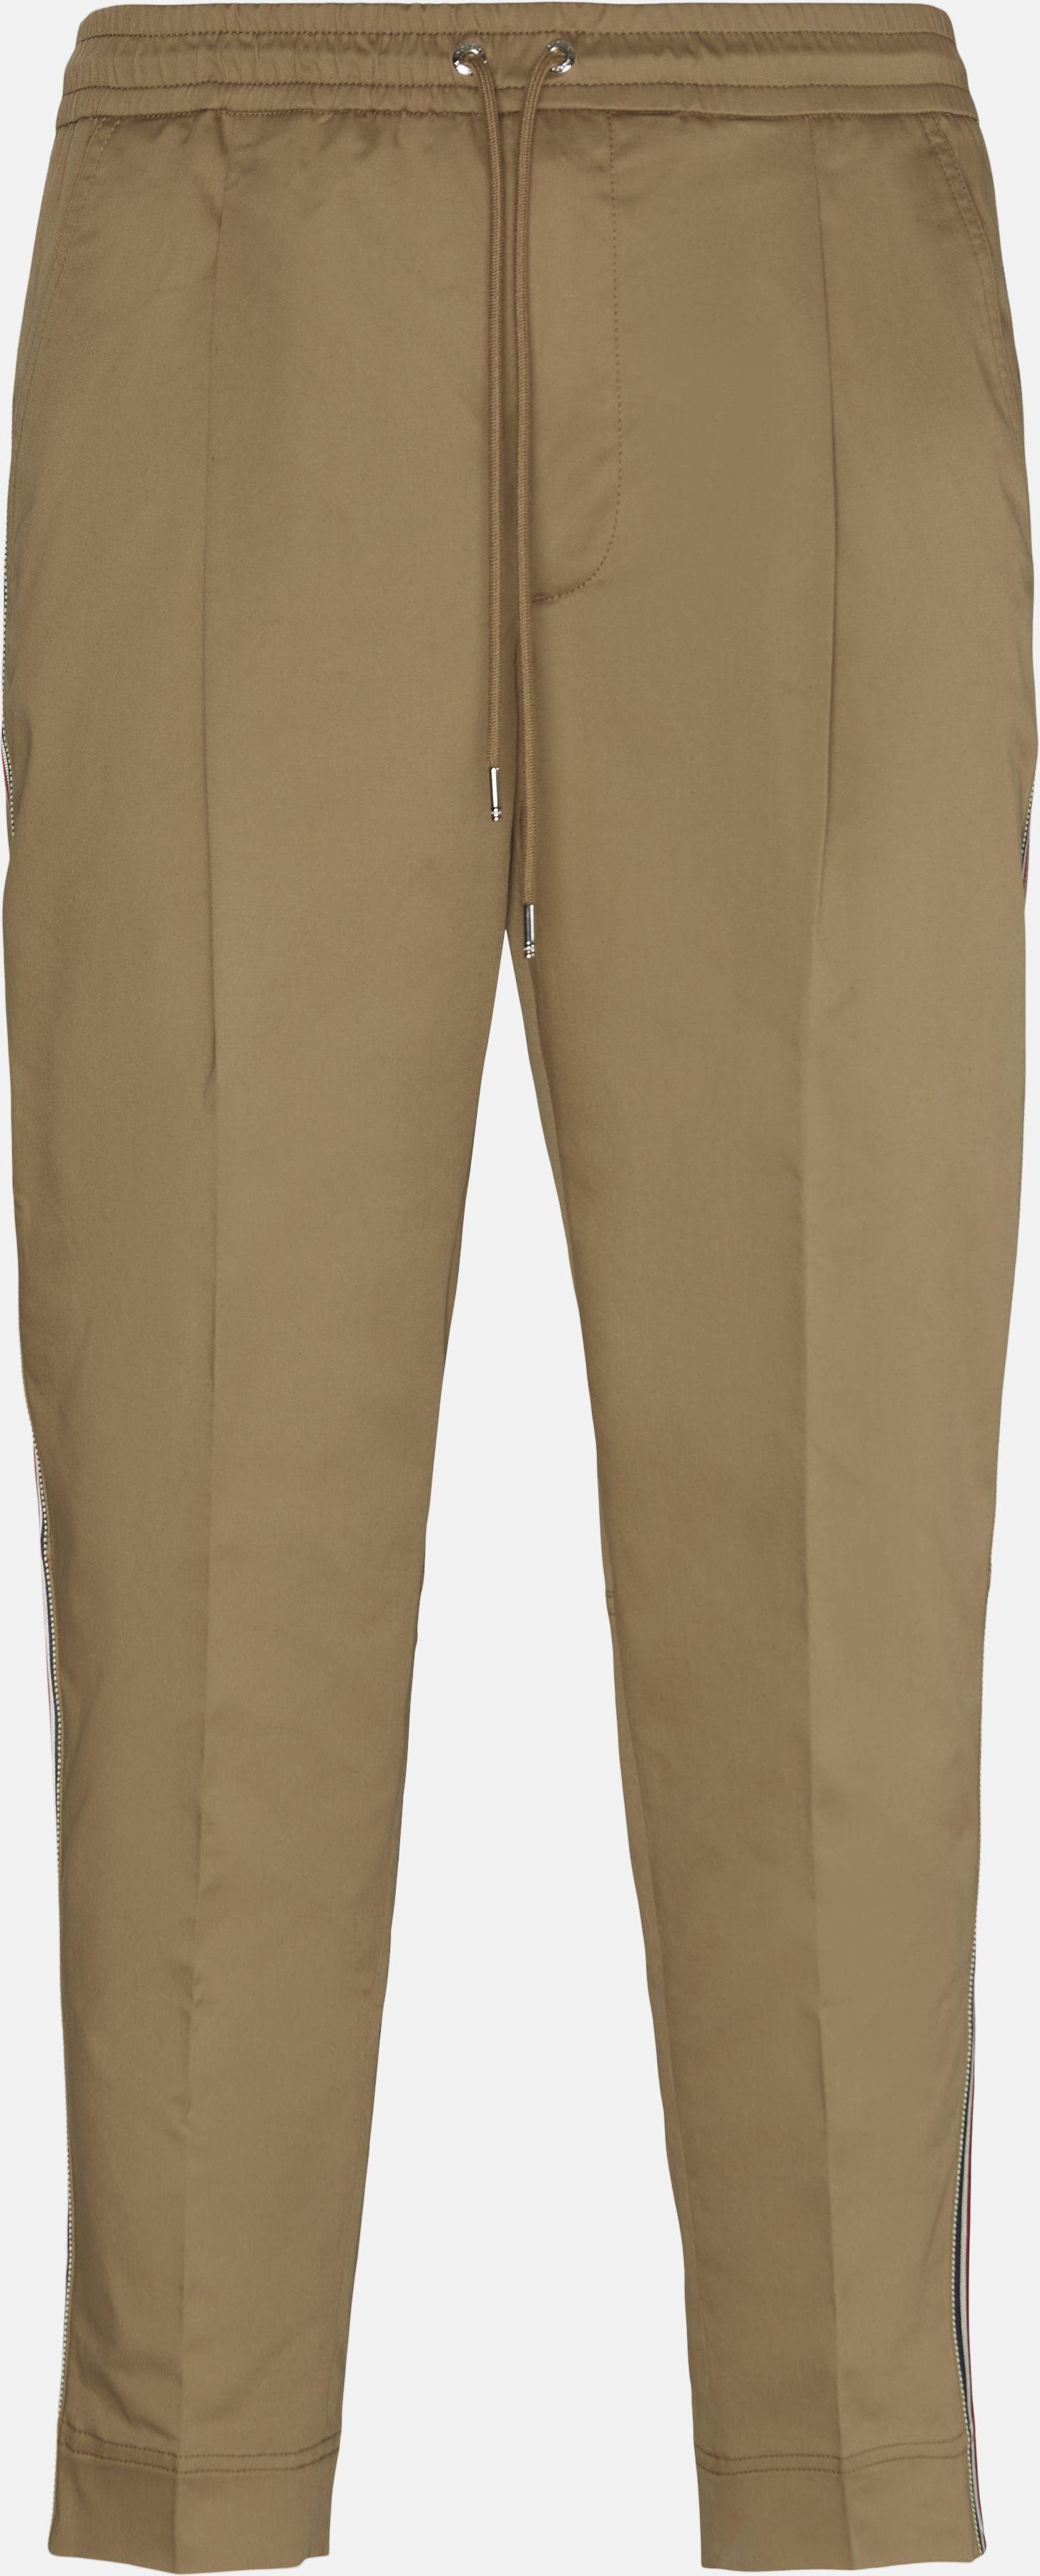 Trousers - Regular - Sand